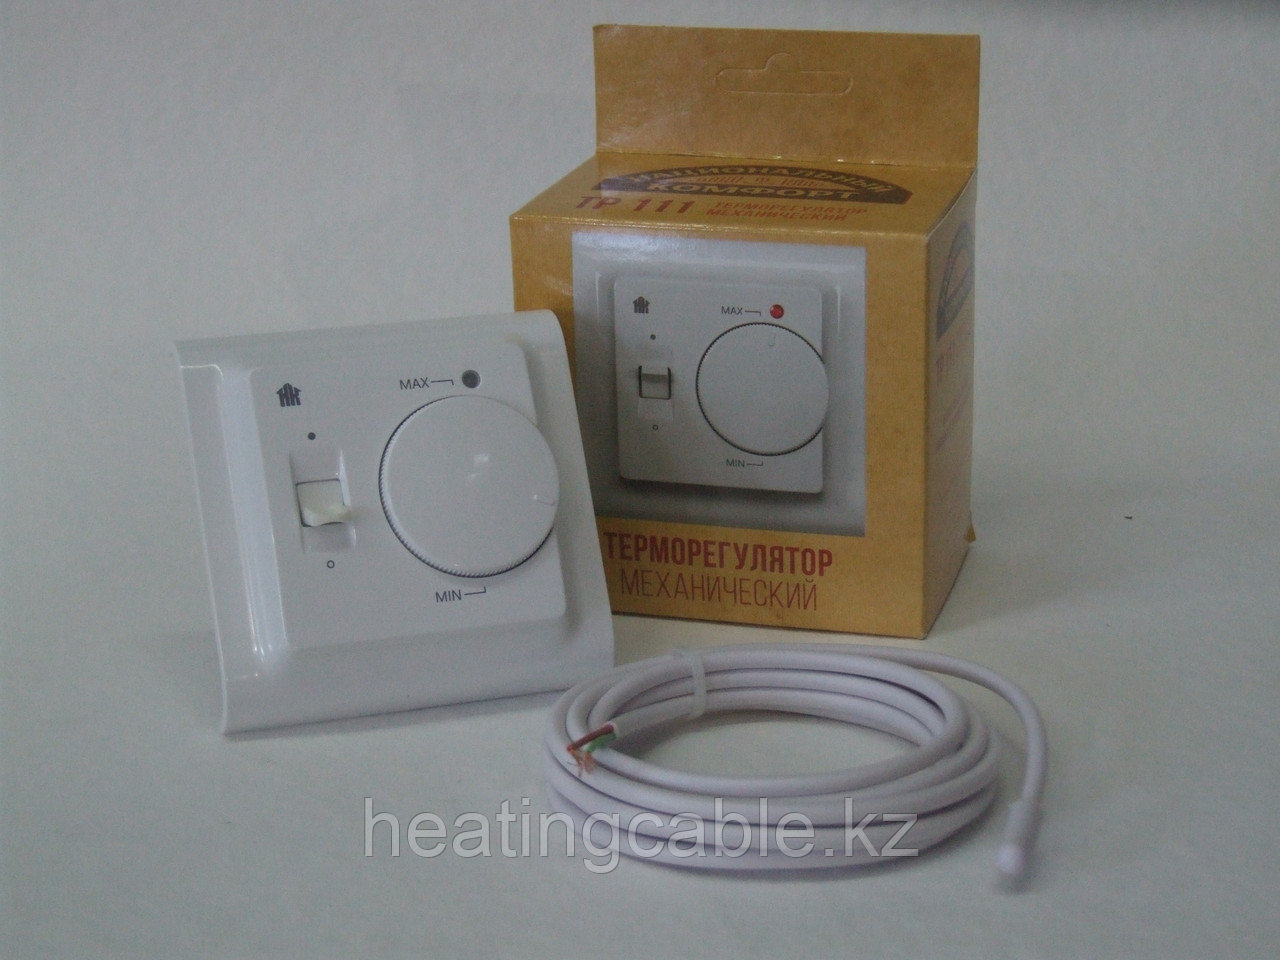 Терморегулятор ТР 111 белый НК